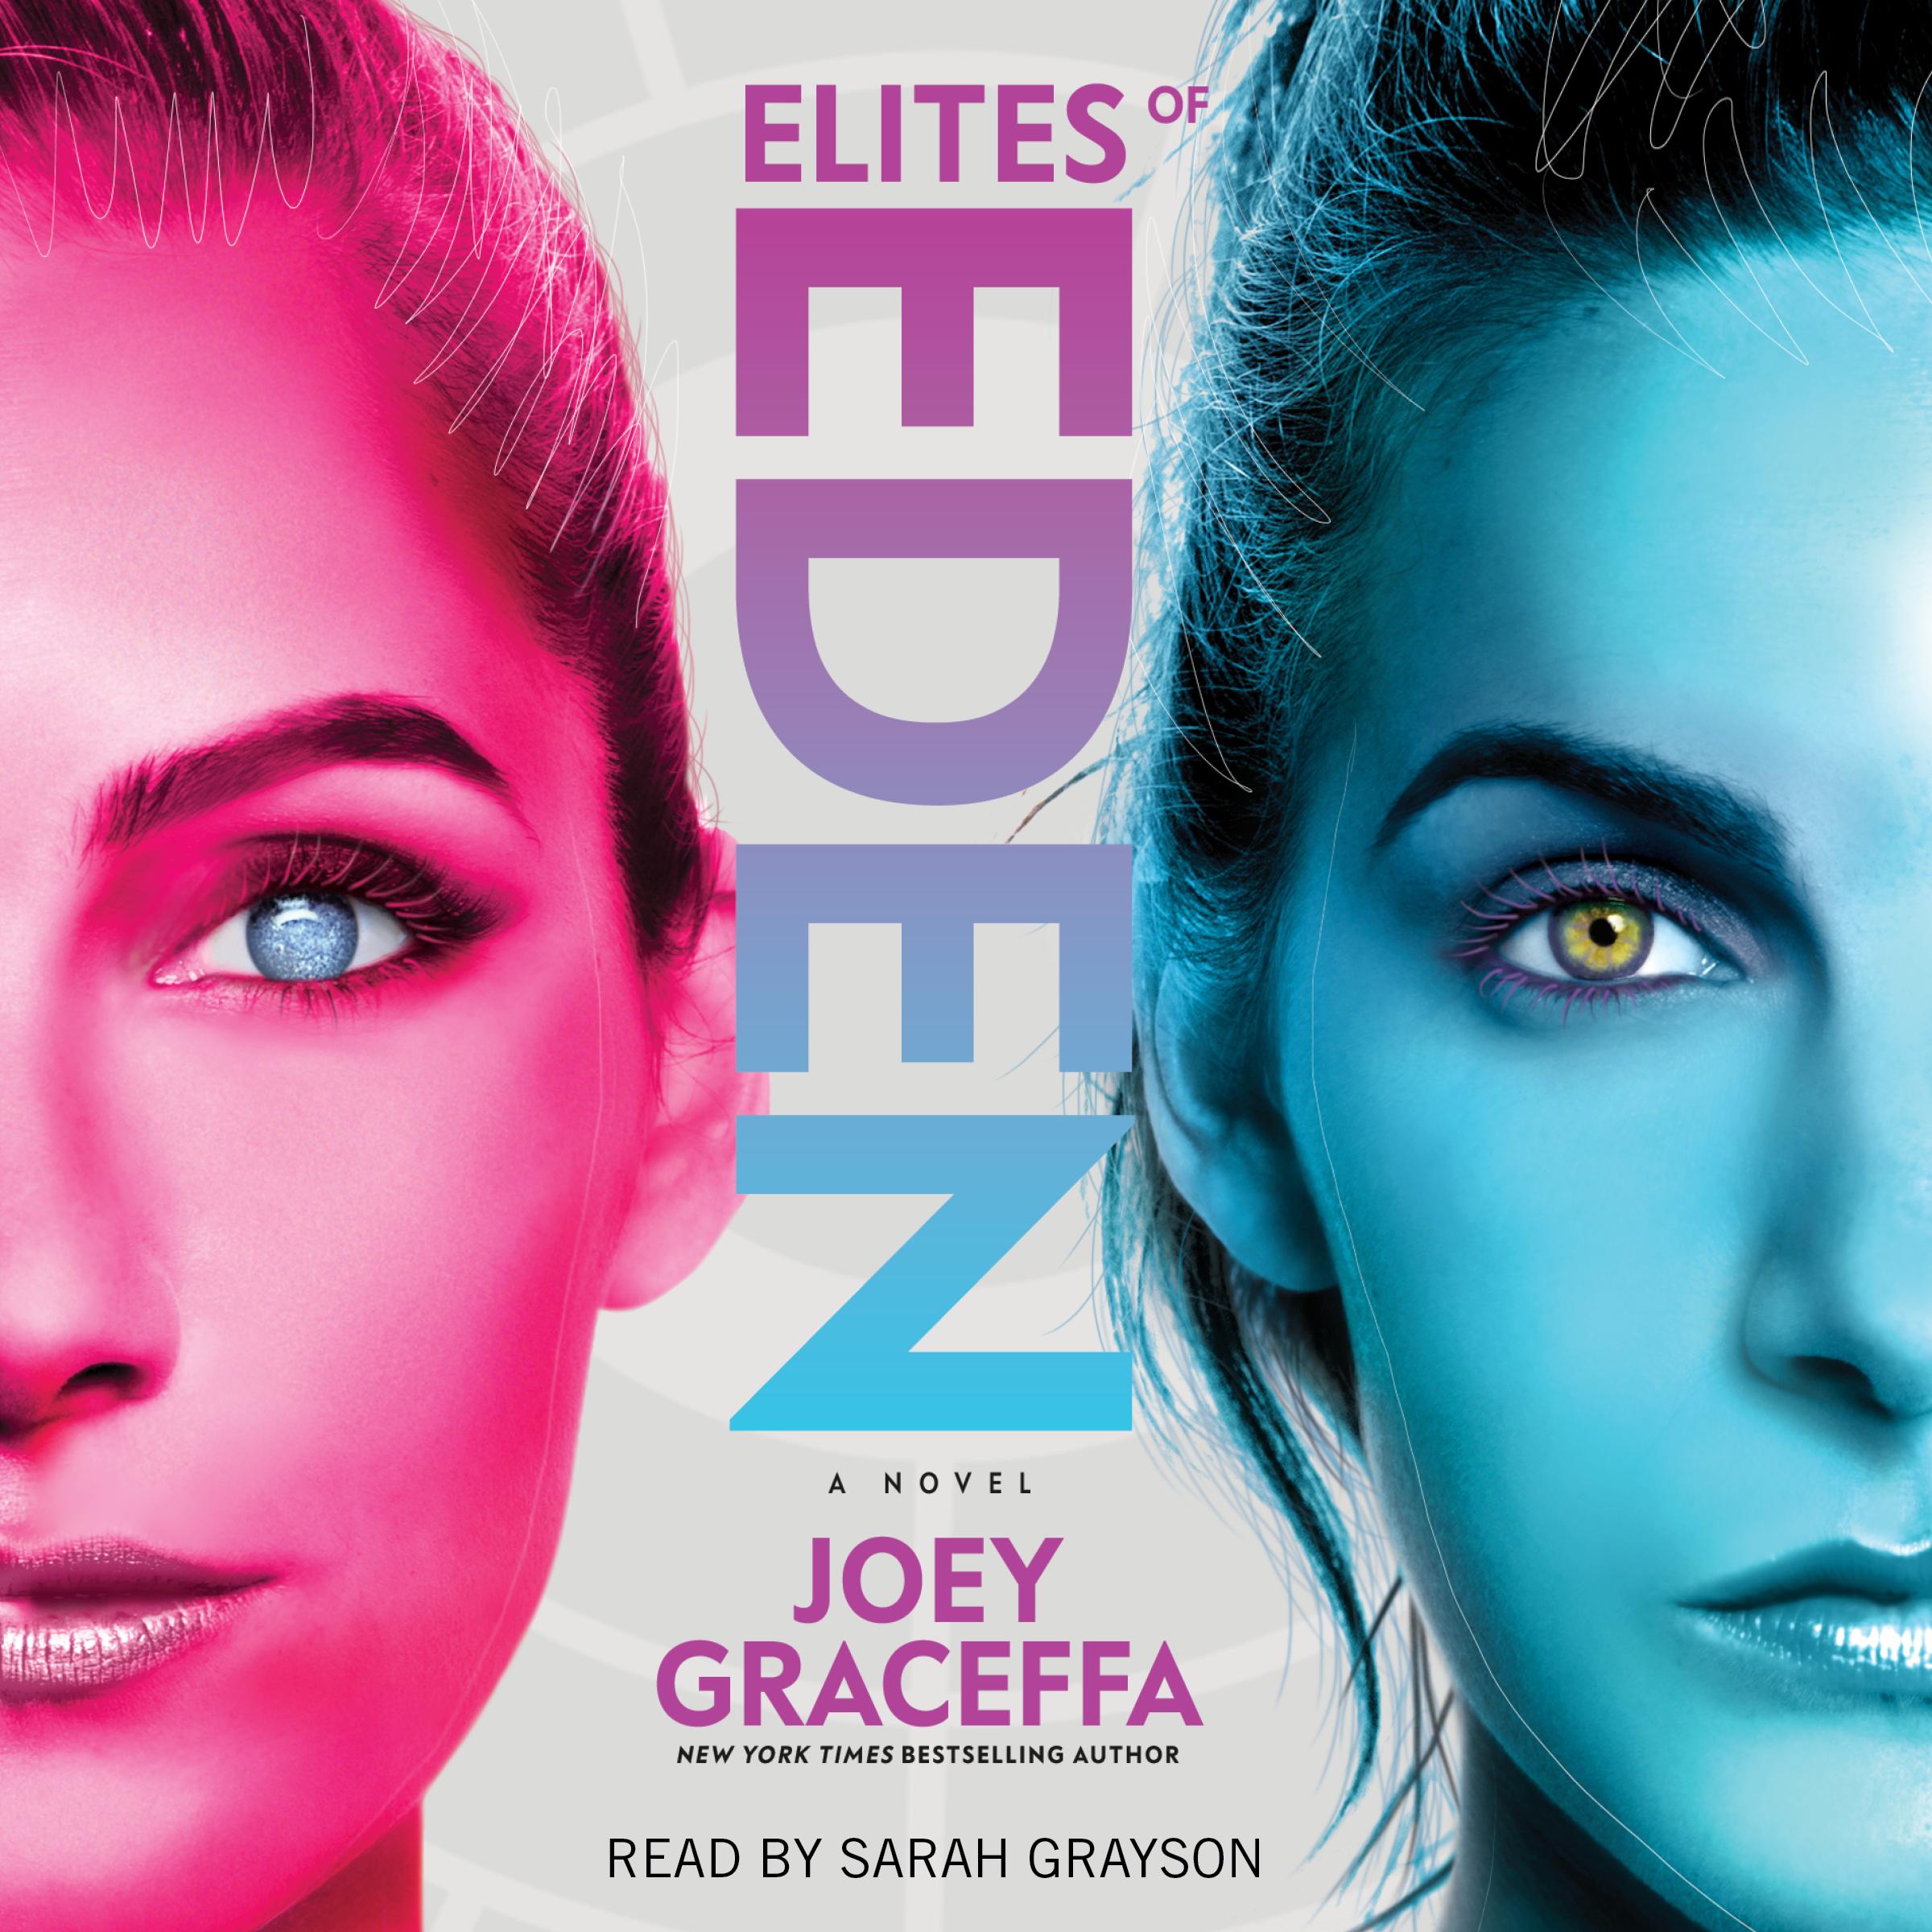 Elites of Eden Audiobook by Joey Graceffa, Sarah Grayson